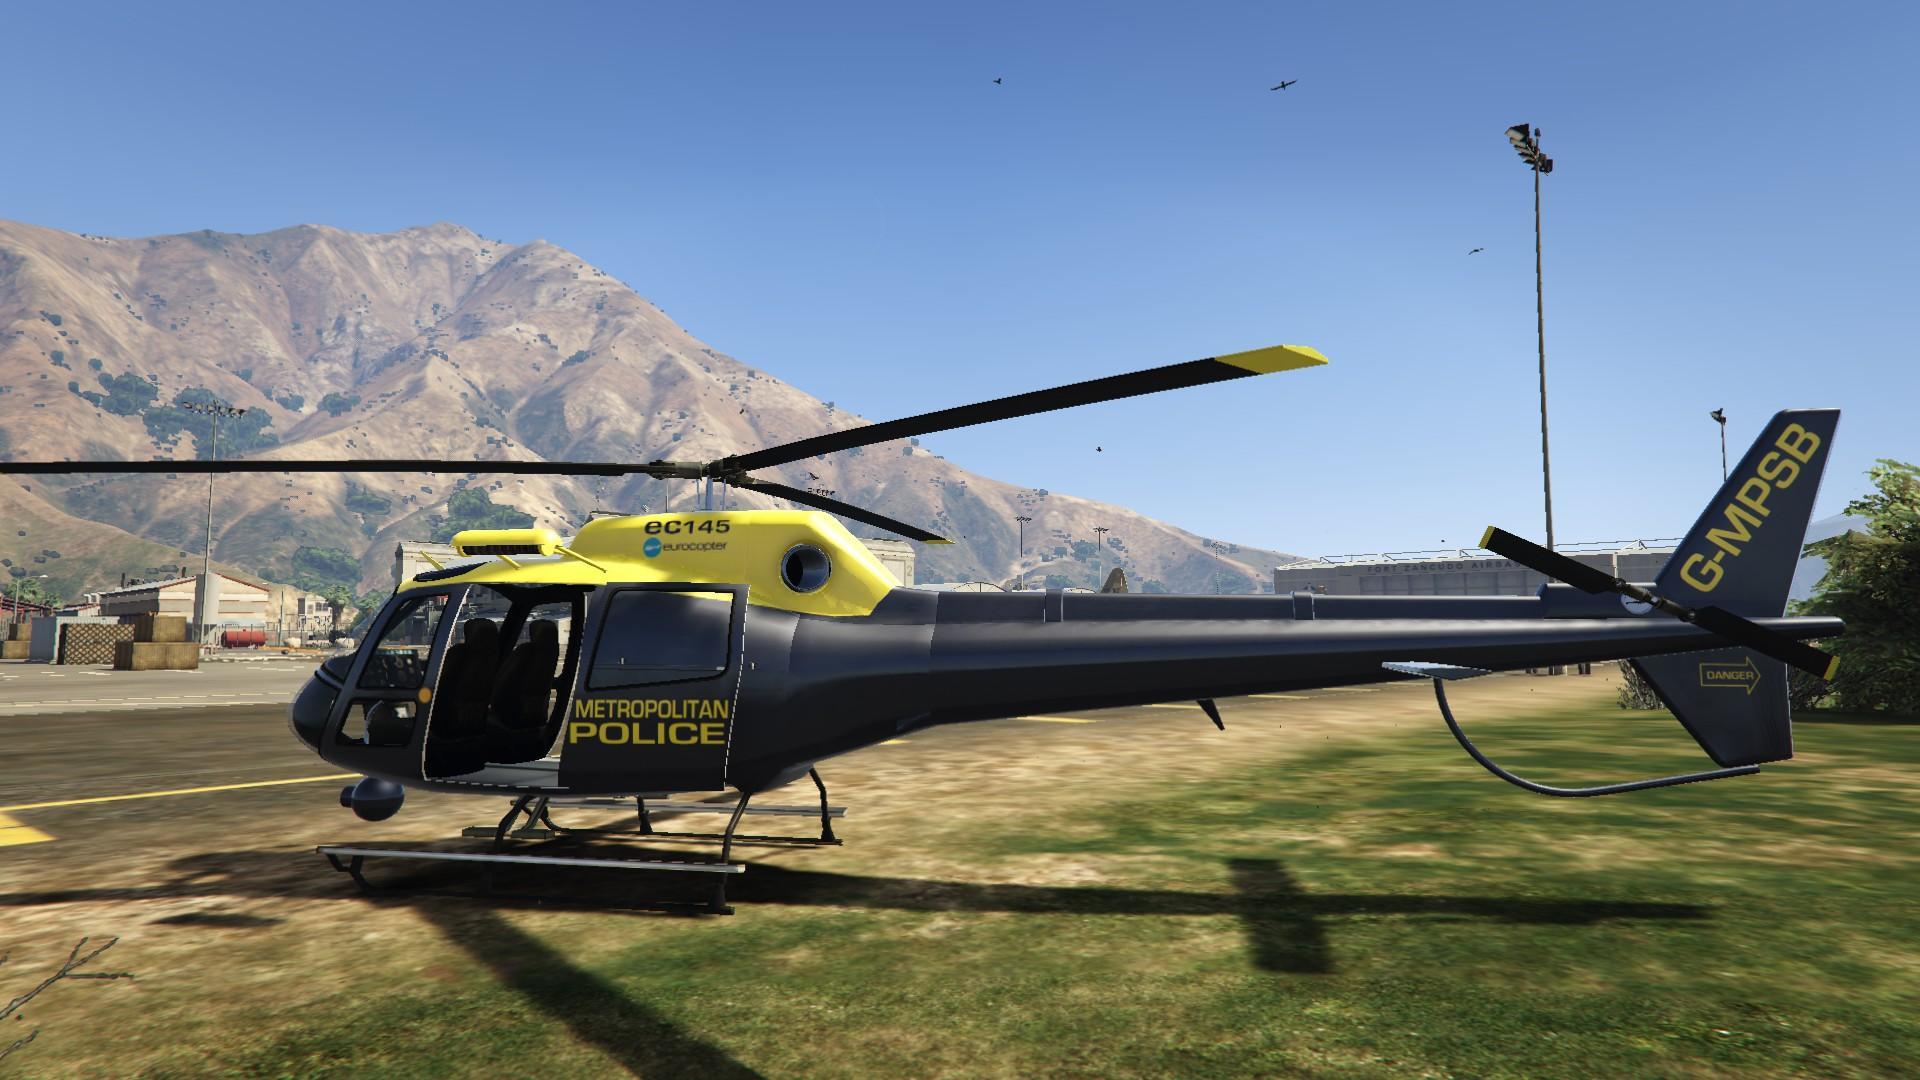 Elicottero Gta 5 : India british metropolitan police helicopter gta